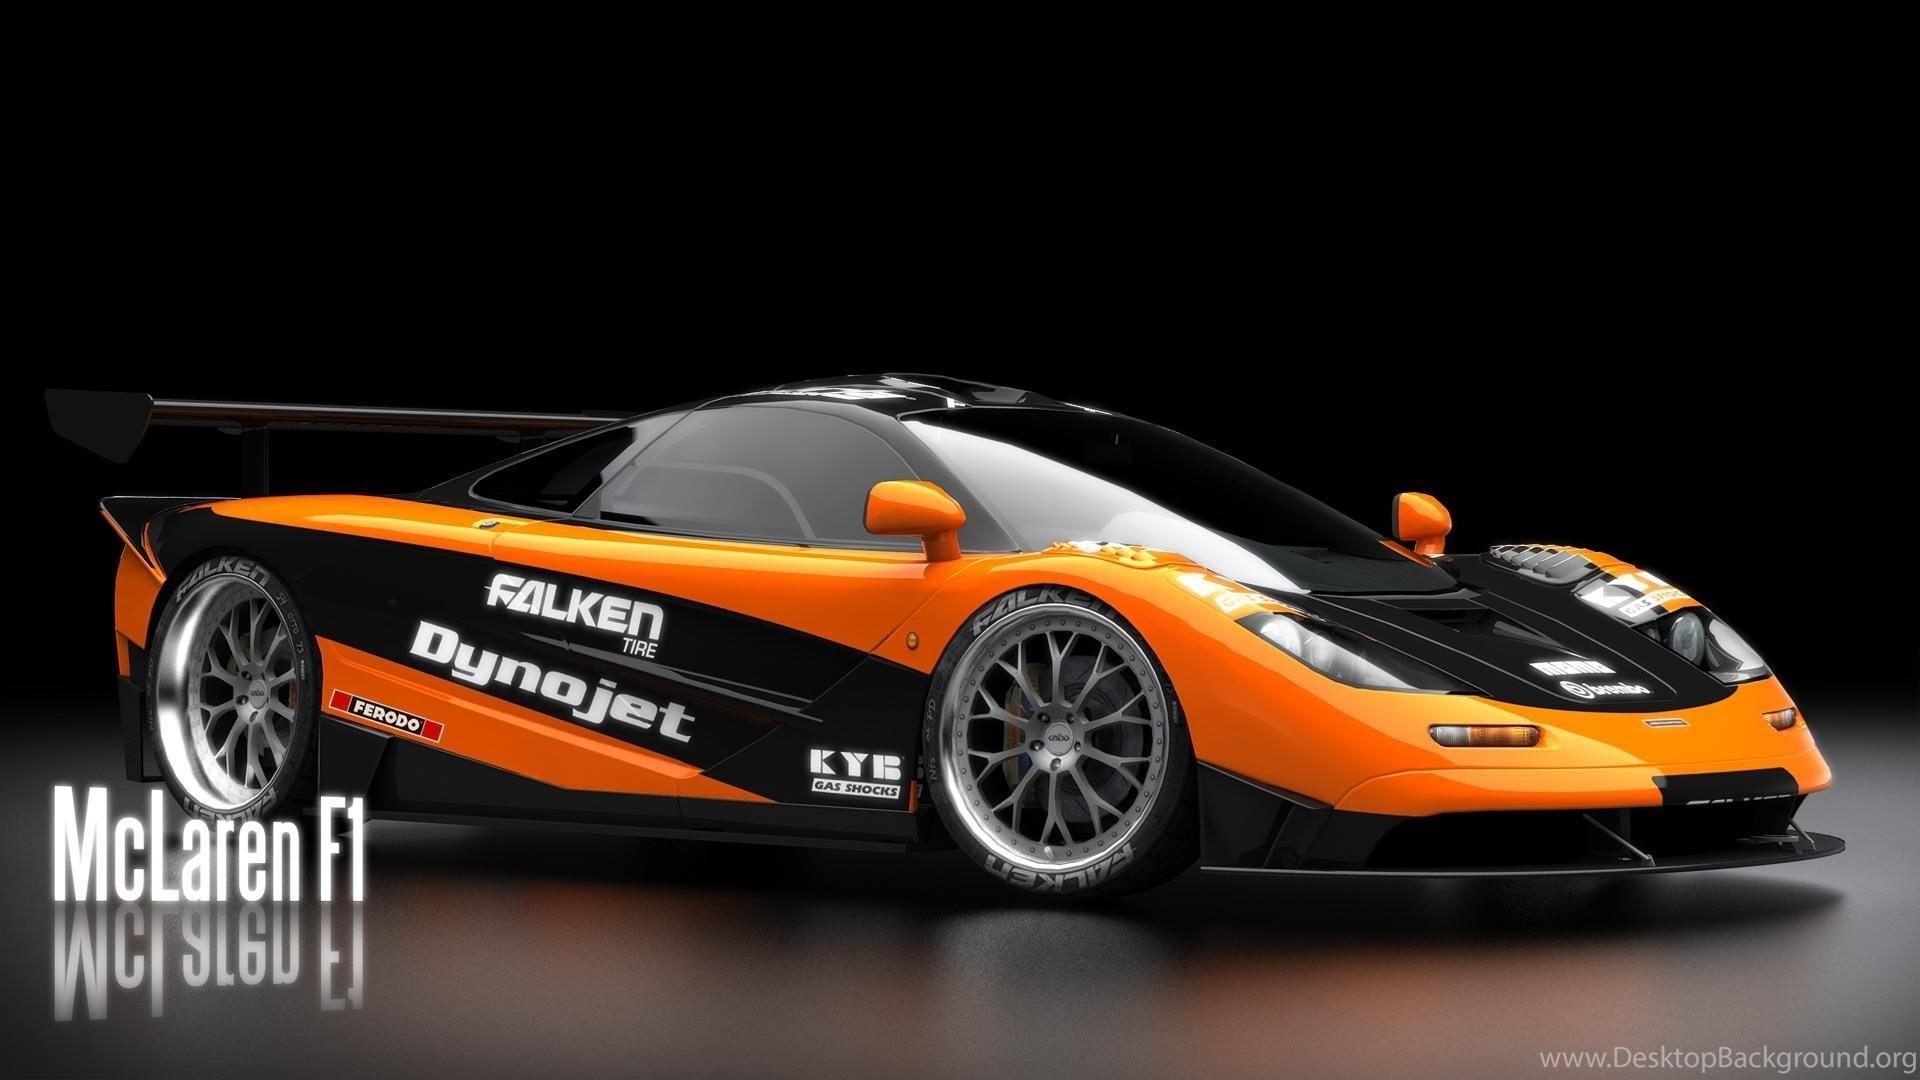 Mclaren F1 Cool Cars Nice Folder 1920x1080 Hd Wallpapers And Desktop Background